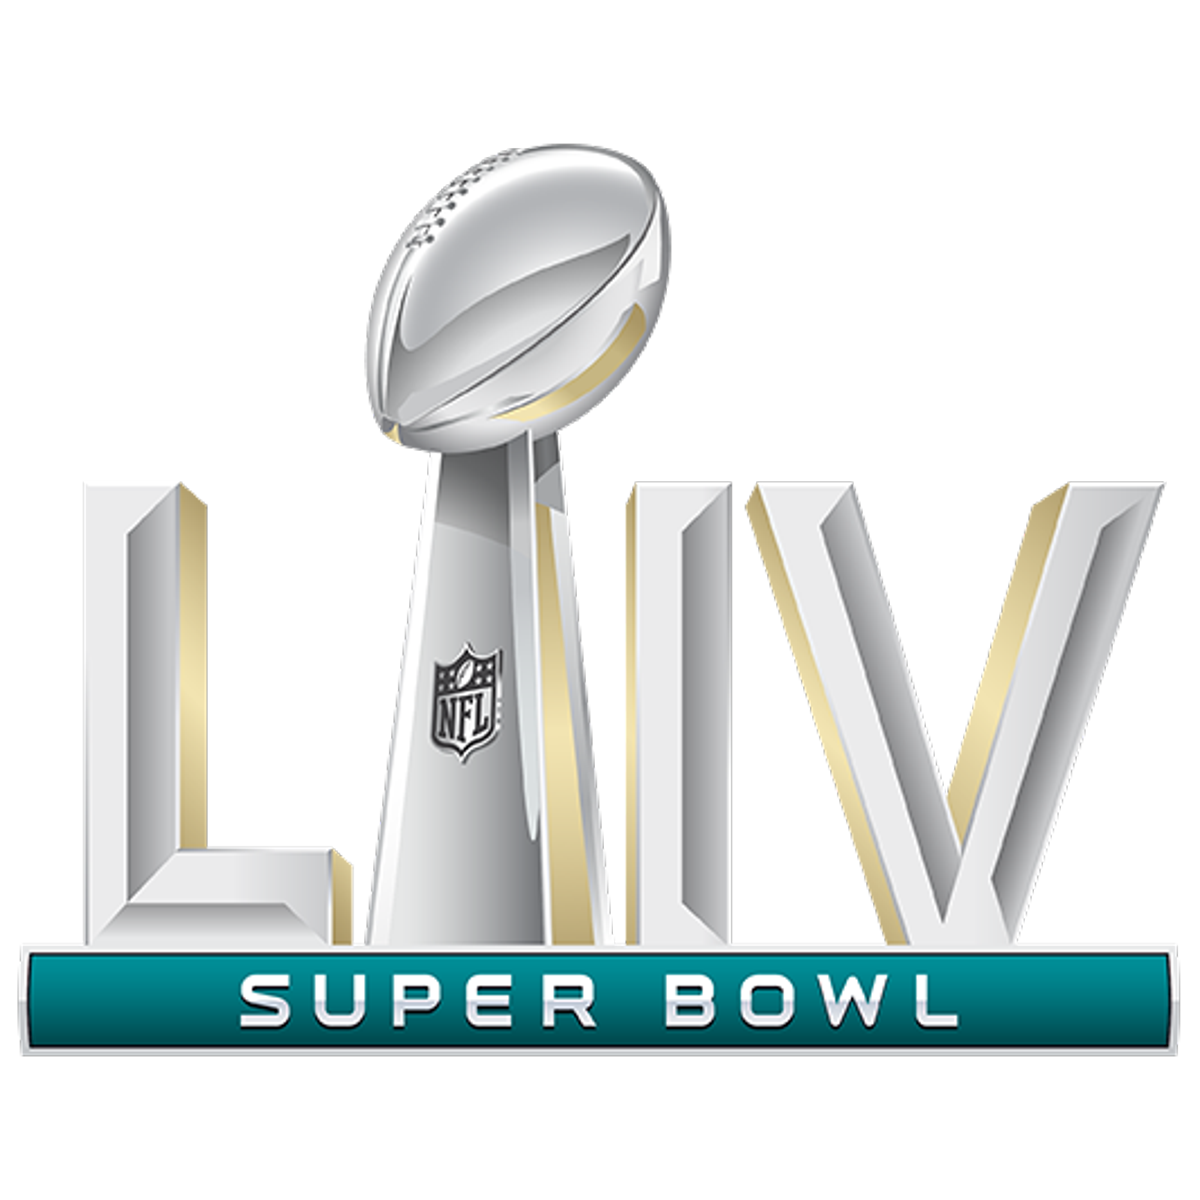 Watch Super Bowl Liv 2020 Live Stream On Iphone Ipad And Apple Tv Super Bowl Nfl Super Bowl Tickets Super Bowl 54